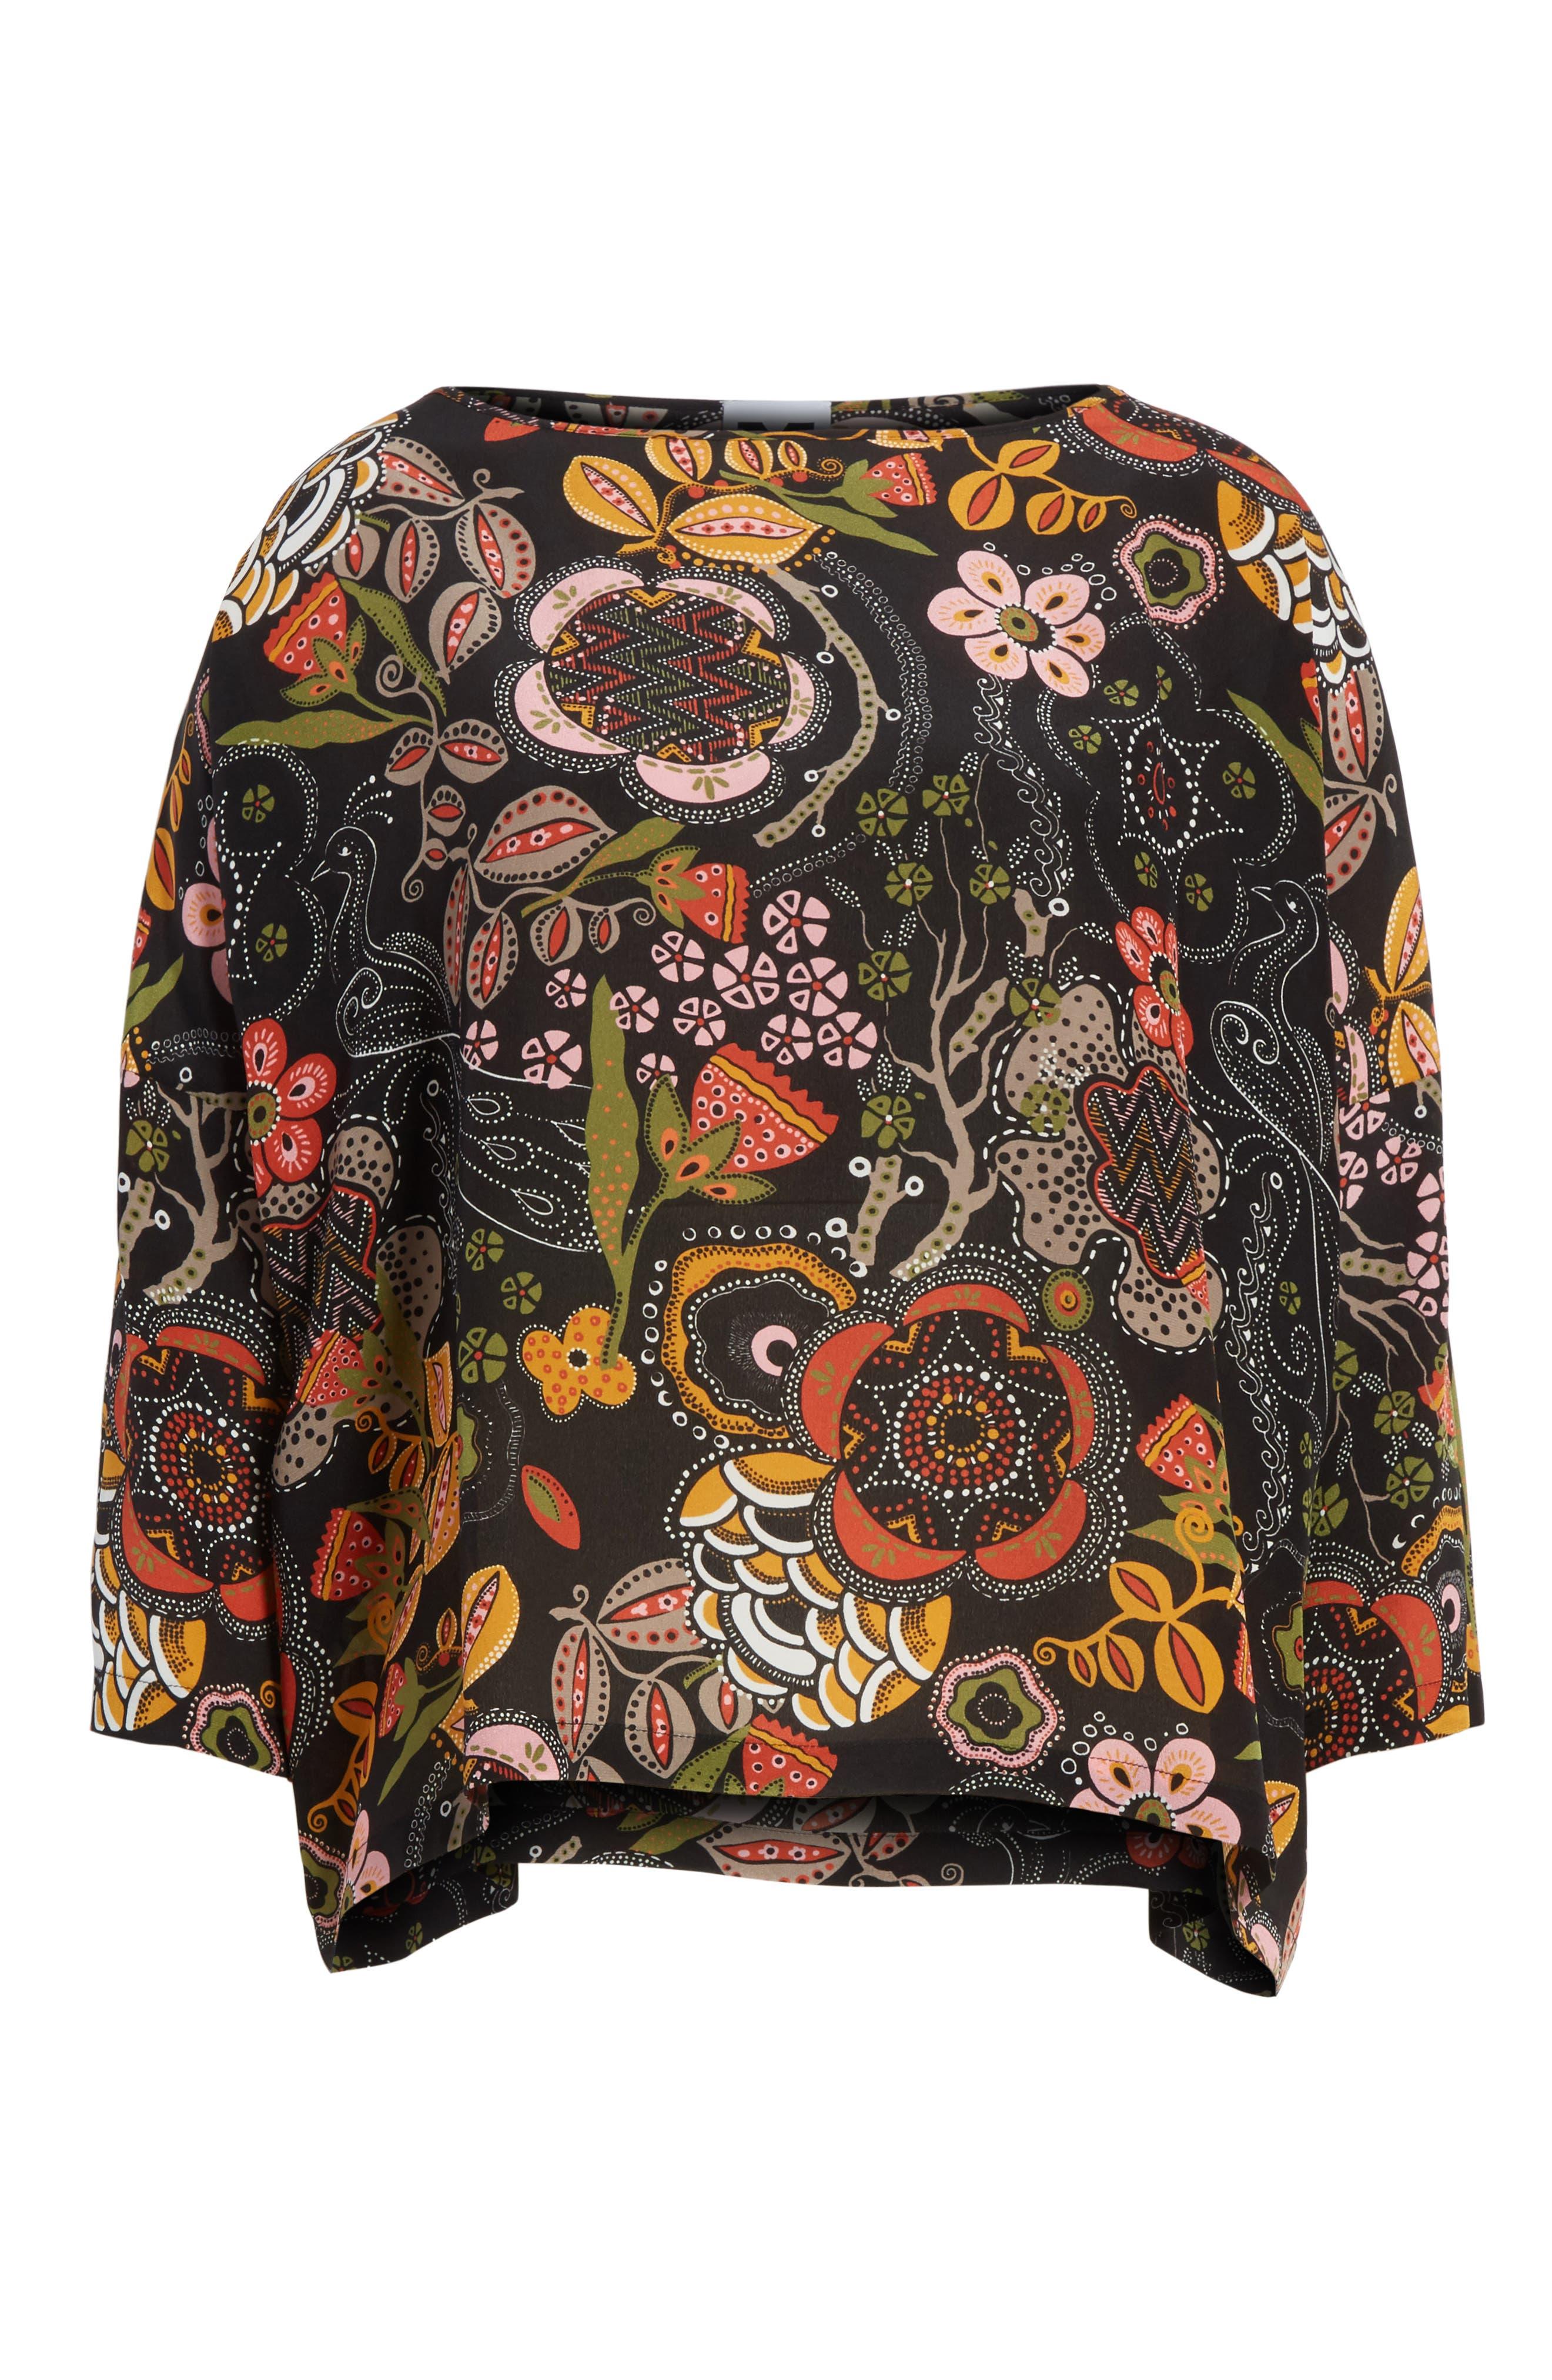 Zigzag Floral Silk Top,                             Alternate thumbnail 6, color,                             001